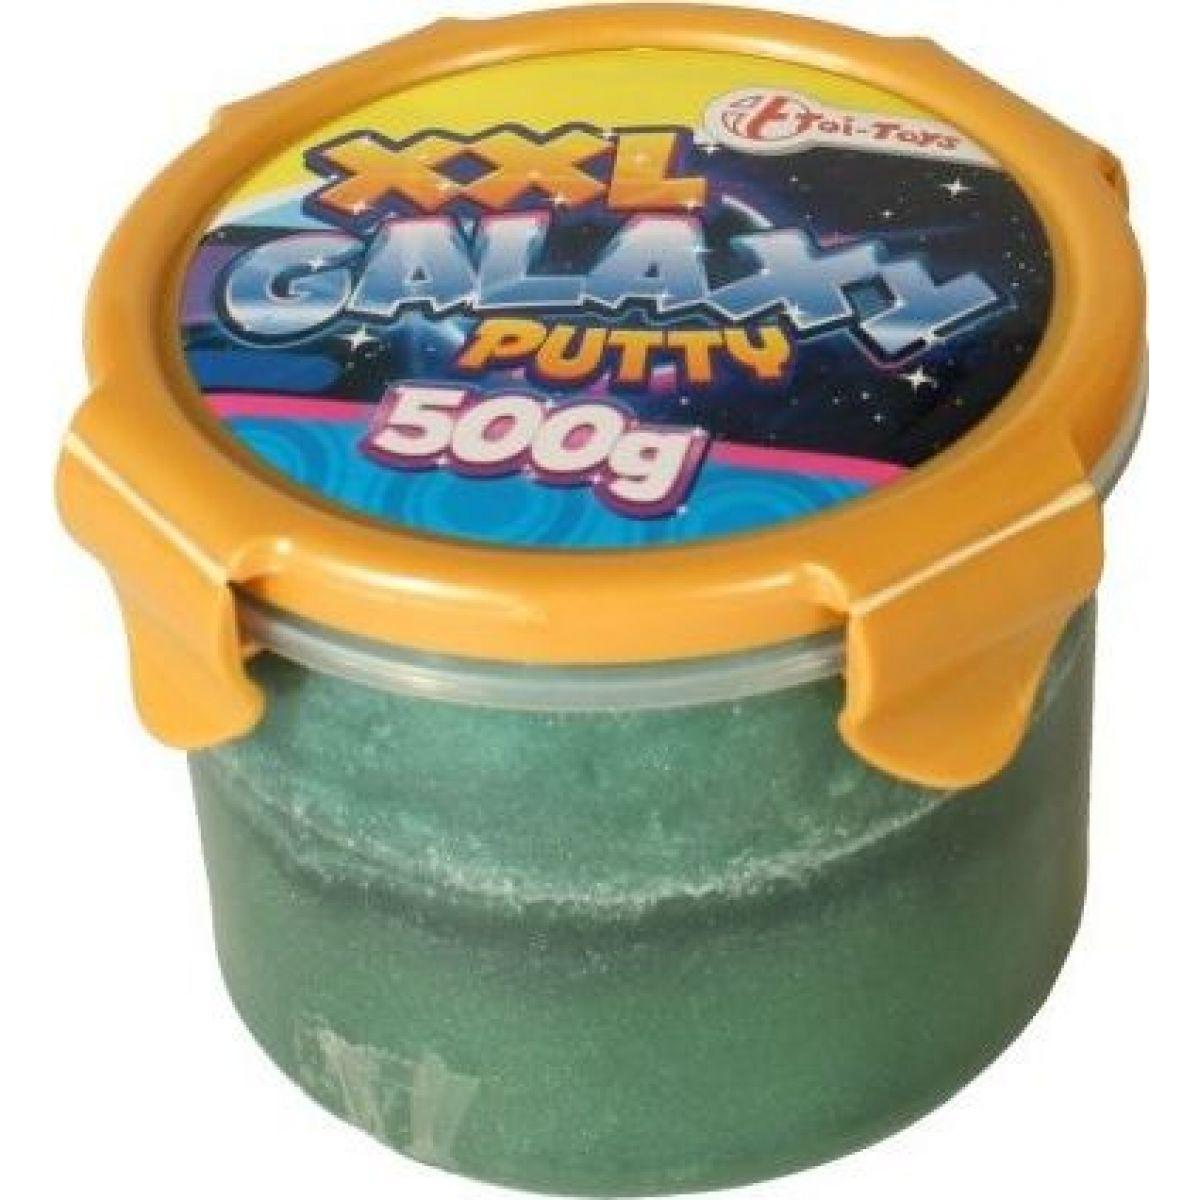 Teddies Inteligentné slizová hmota galaxie 500g tmavo zelená